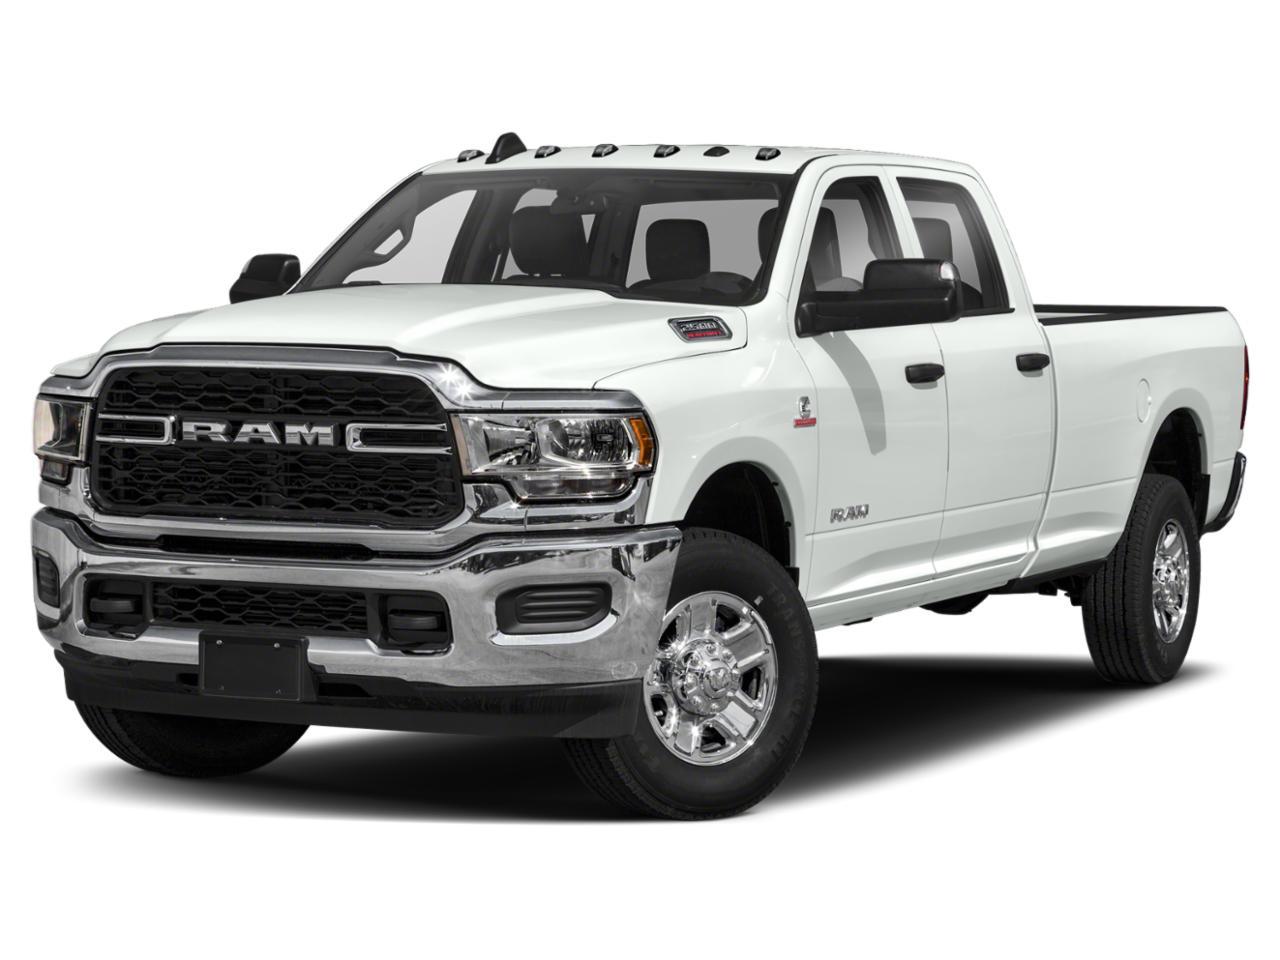 2019 Ram 2500 Vehicle Photo in Owensboro, KY 42303